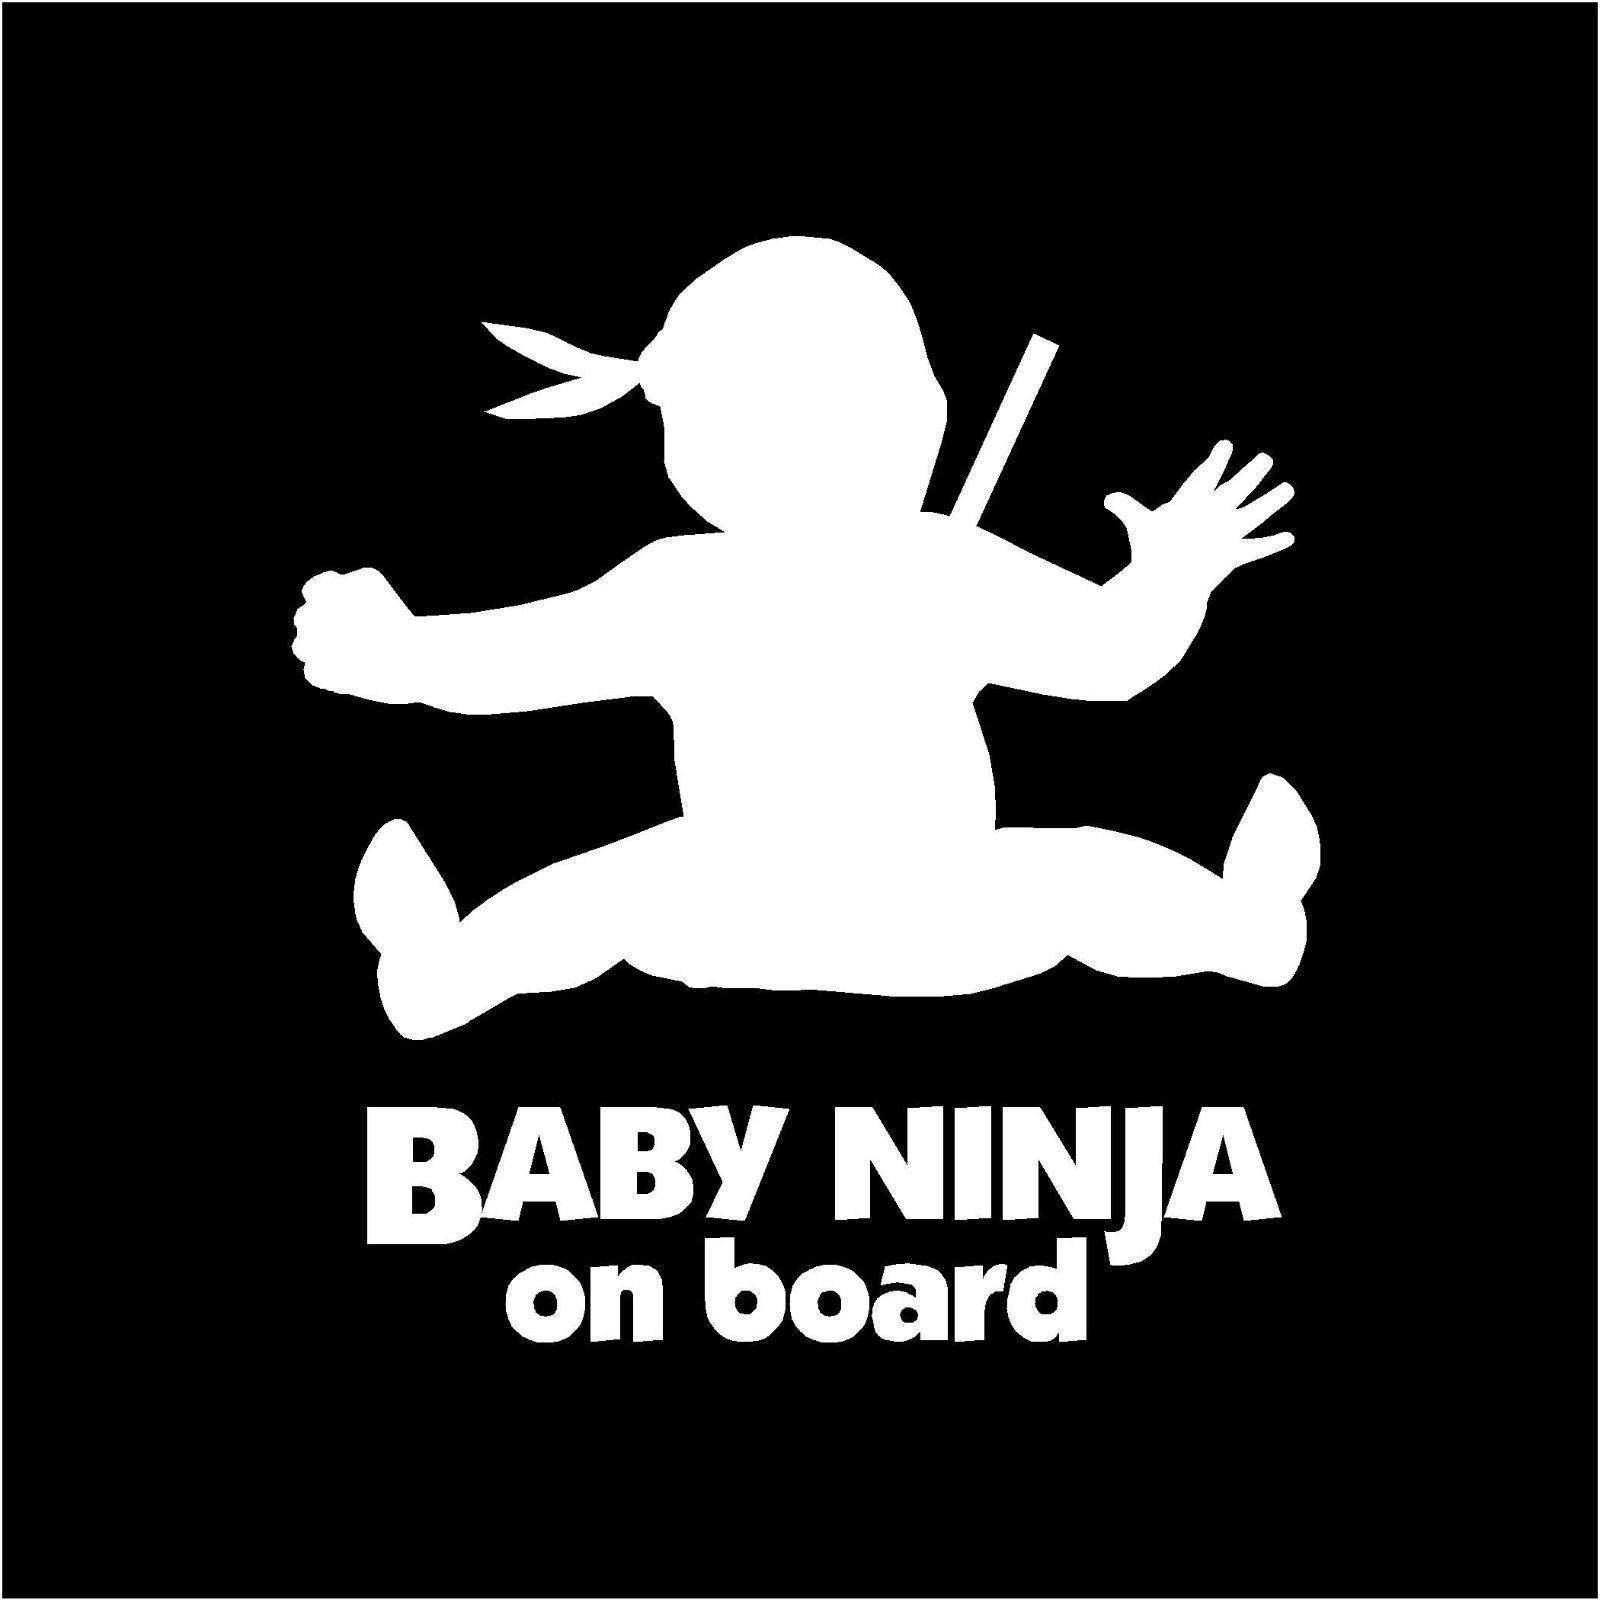 Baby On Board Baby Ninja Vinyl Car Window Decal Sticker Kung Fu Karate Car Window Decals Decals Stickers Kung Fu [ 1600 x 1600 Pixel ]